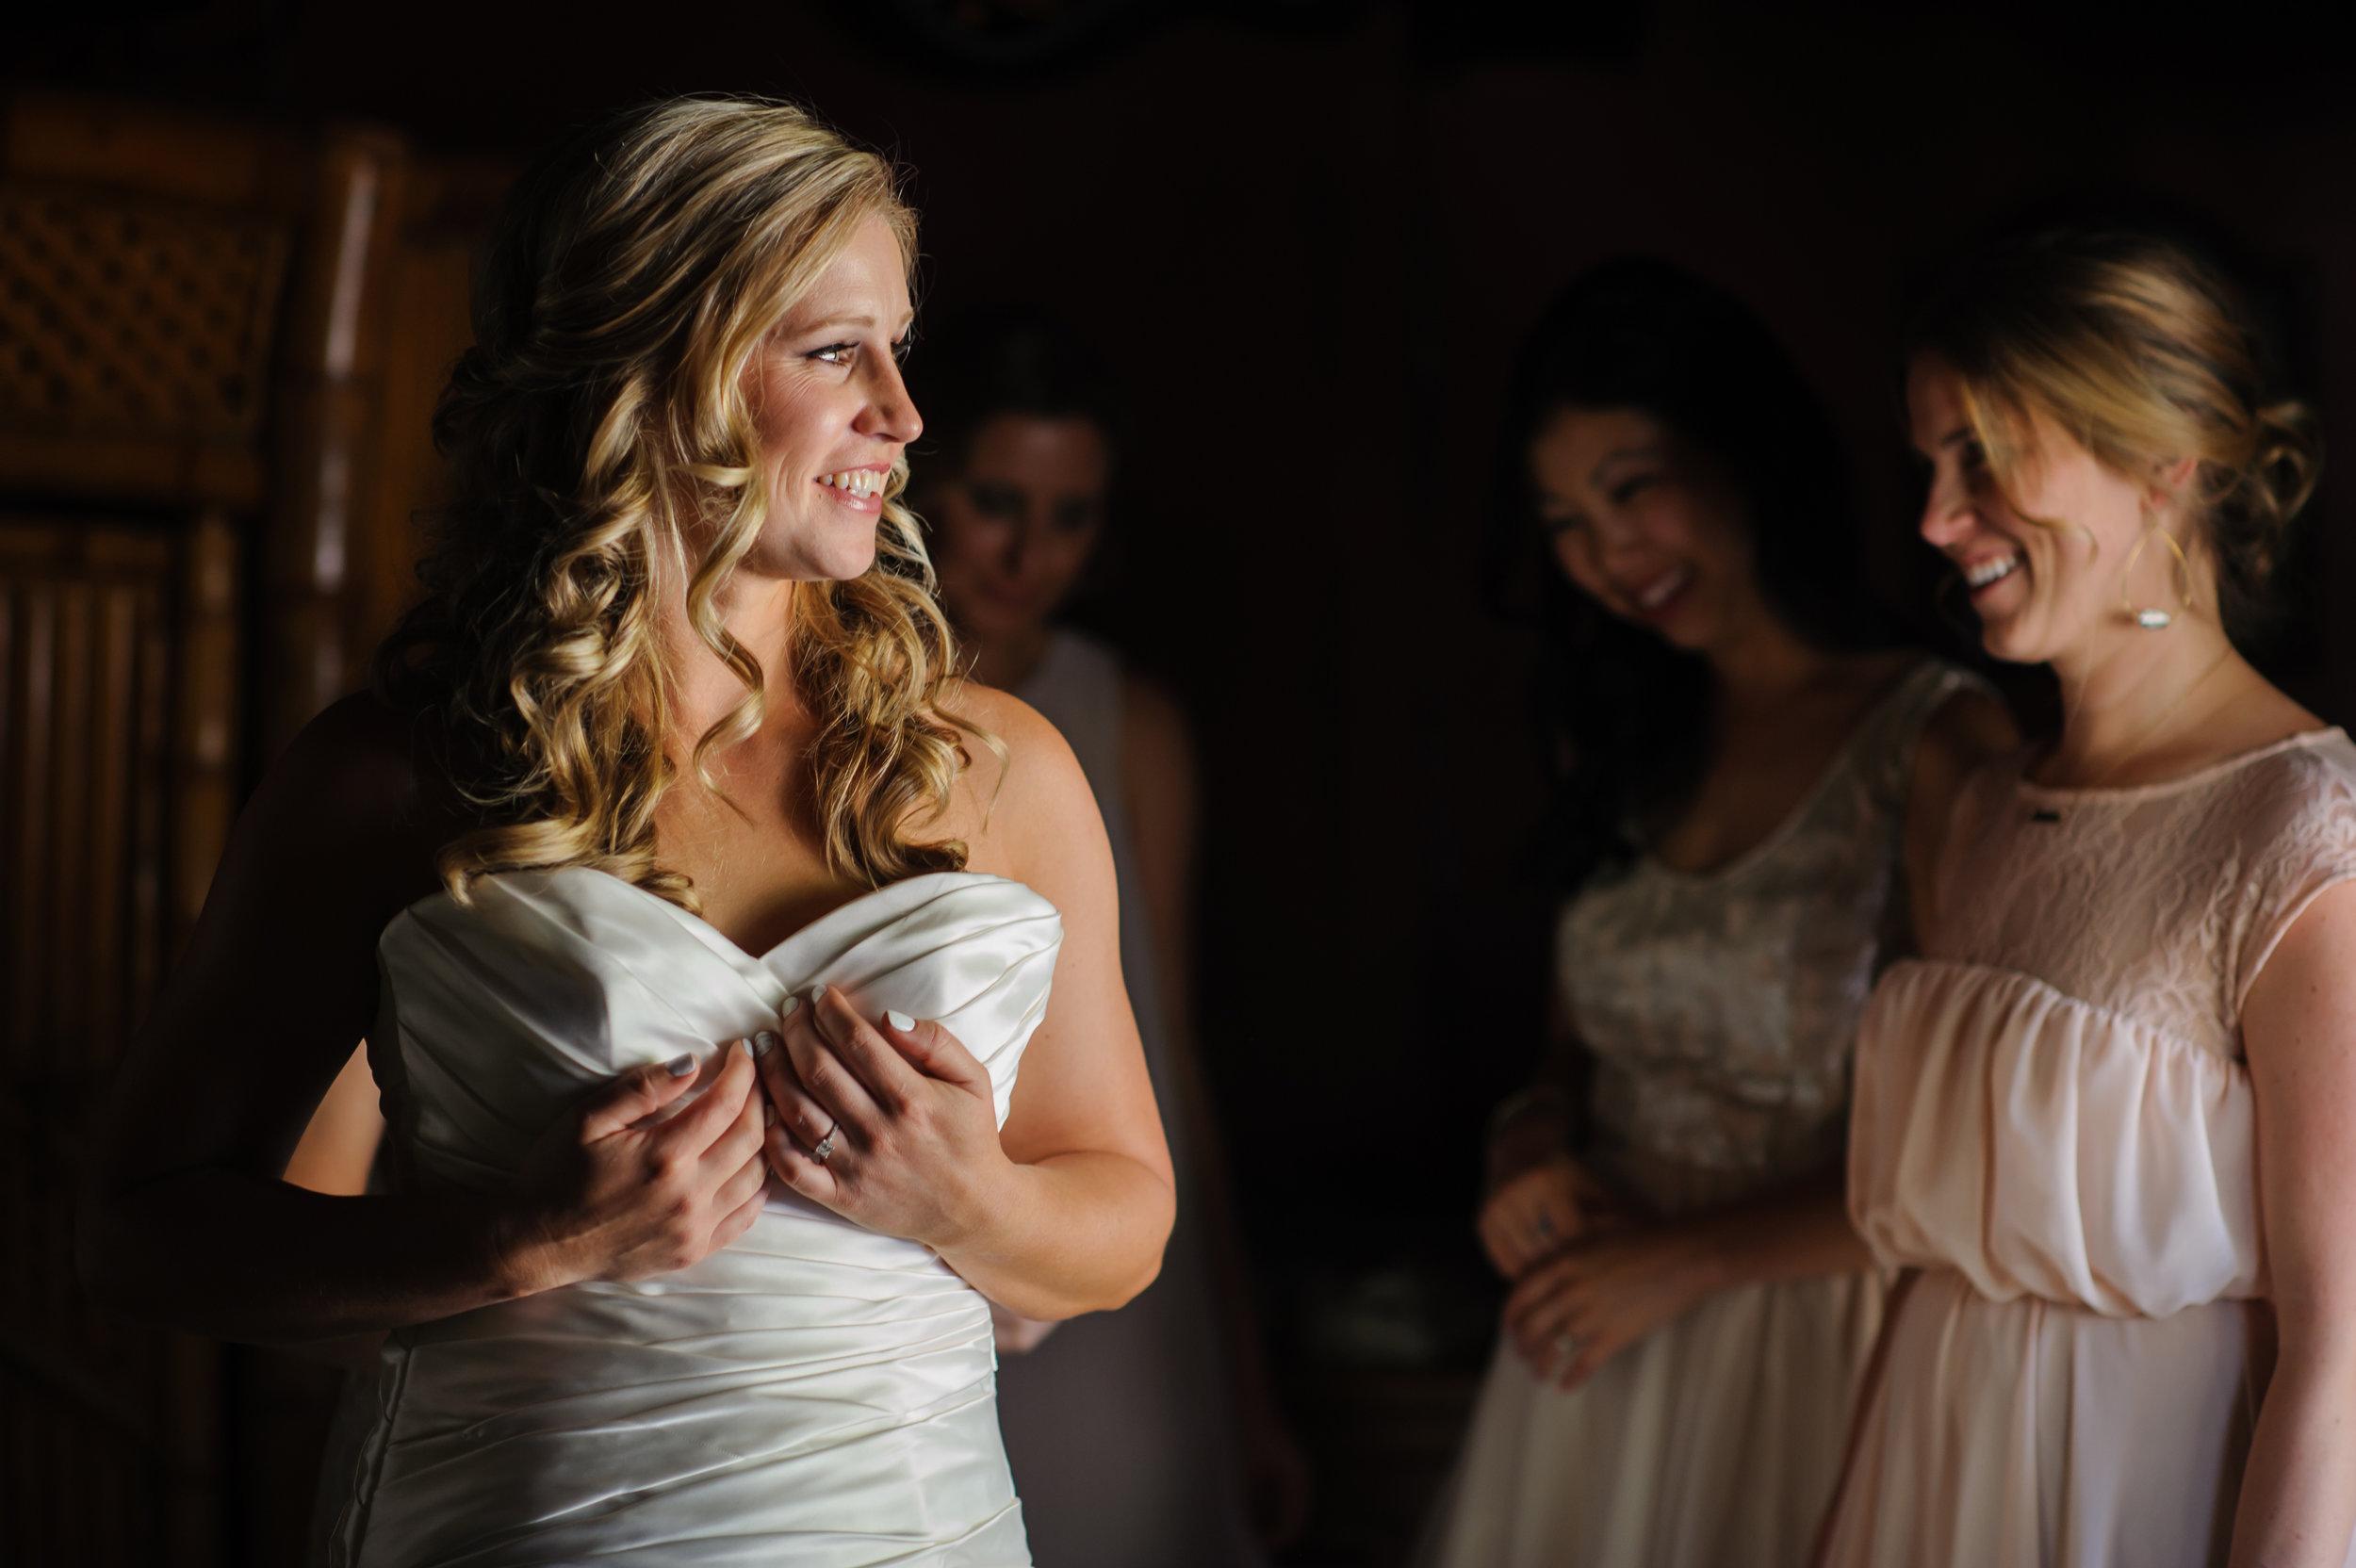 lindsey-alex-007-backyard-sacramento-wedding-photographer-katherine-nicole-photography.JPG